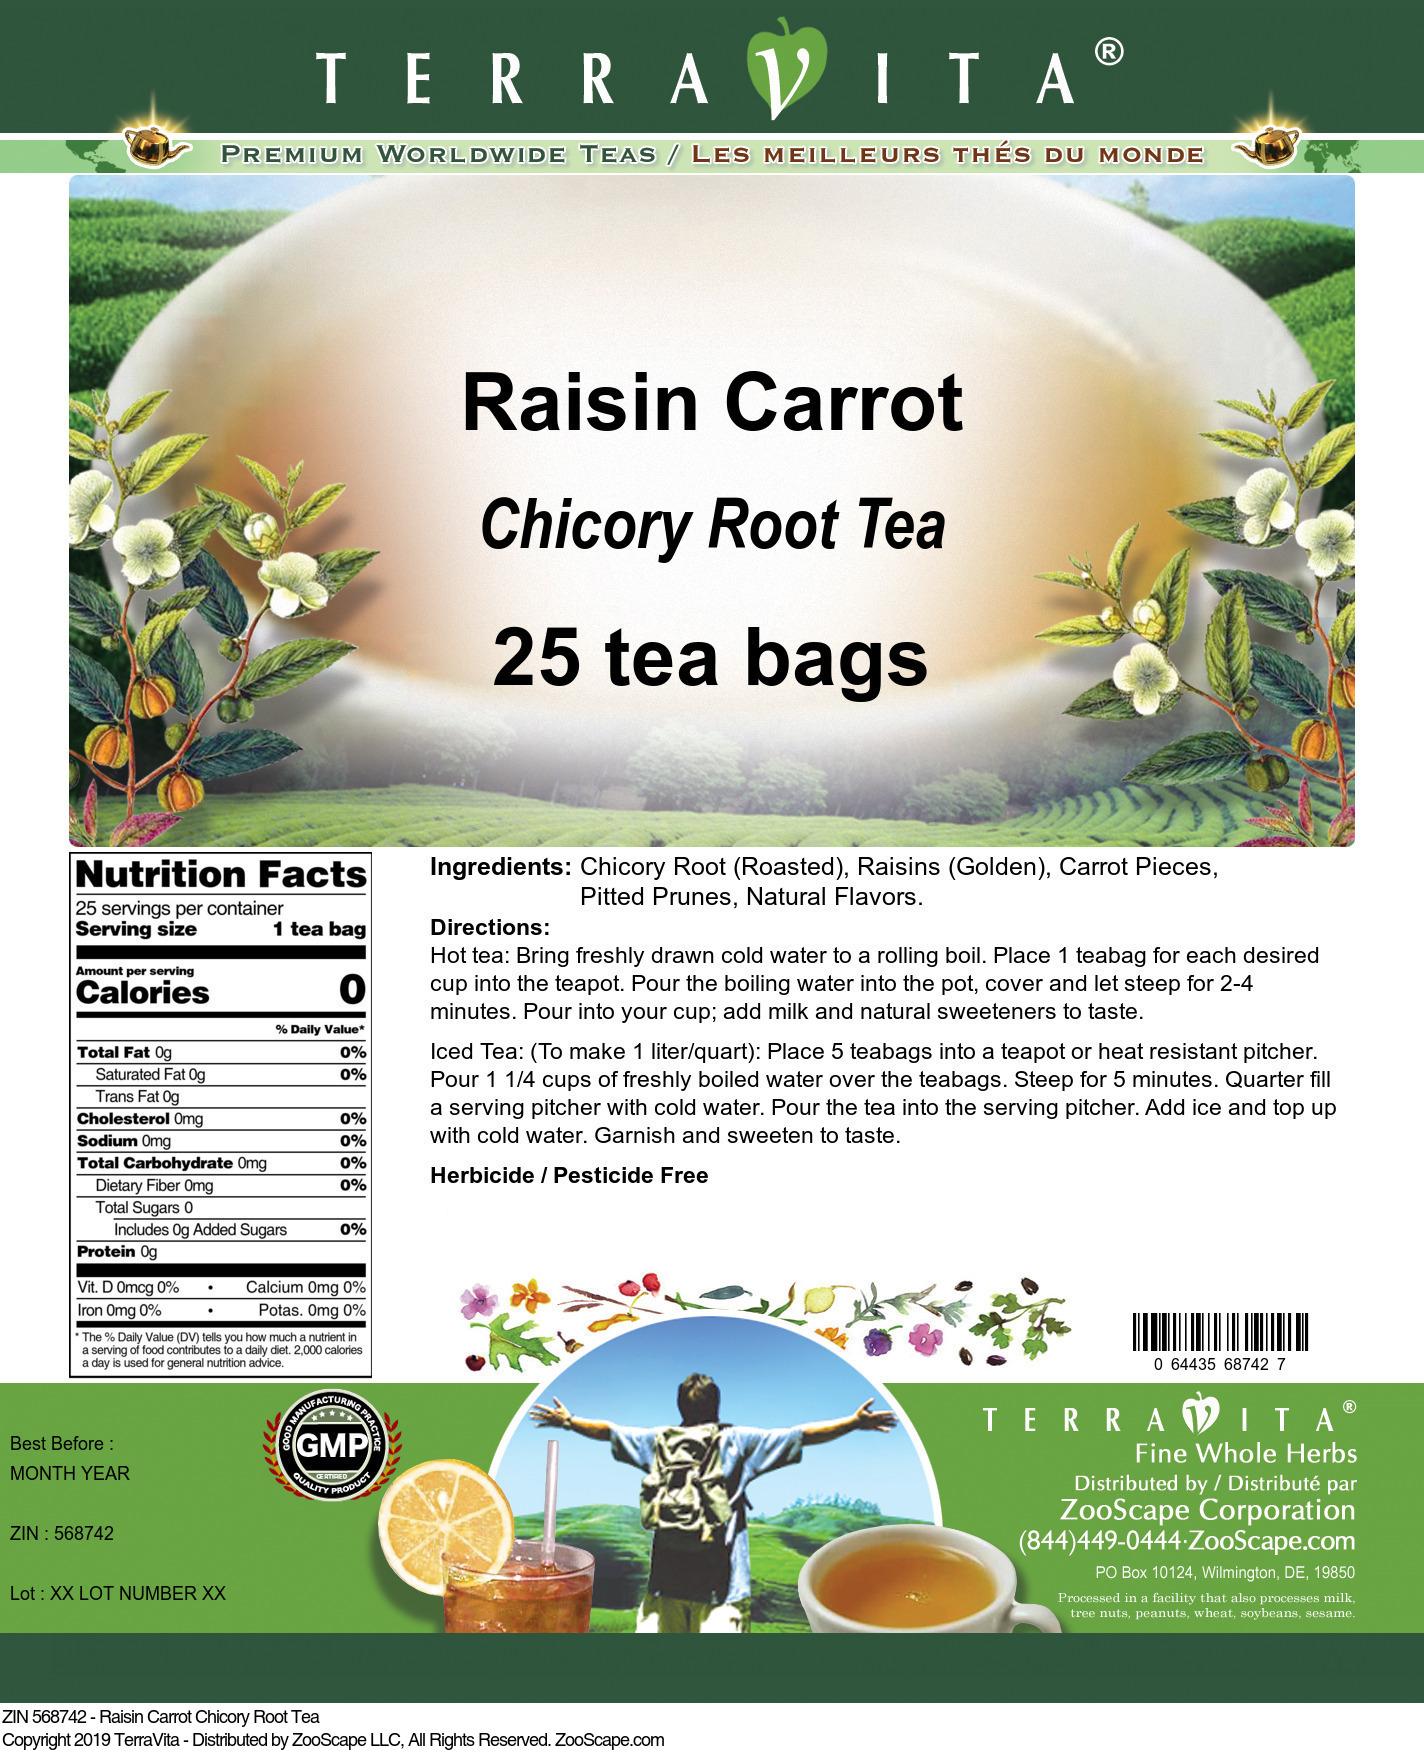 Raisin Carrot Chicory Root Tea